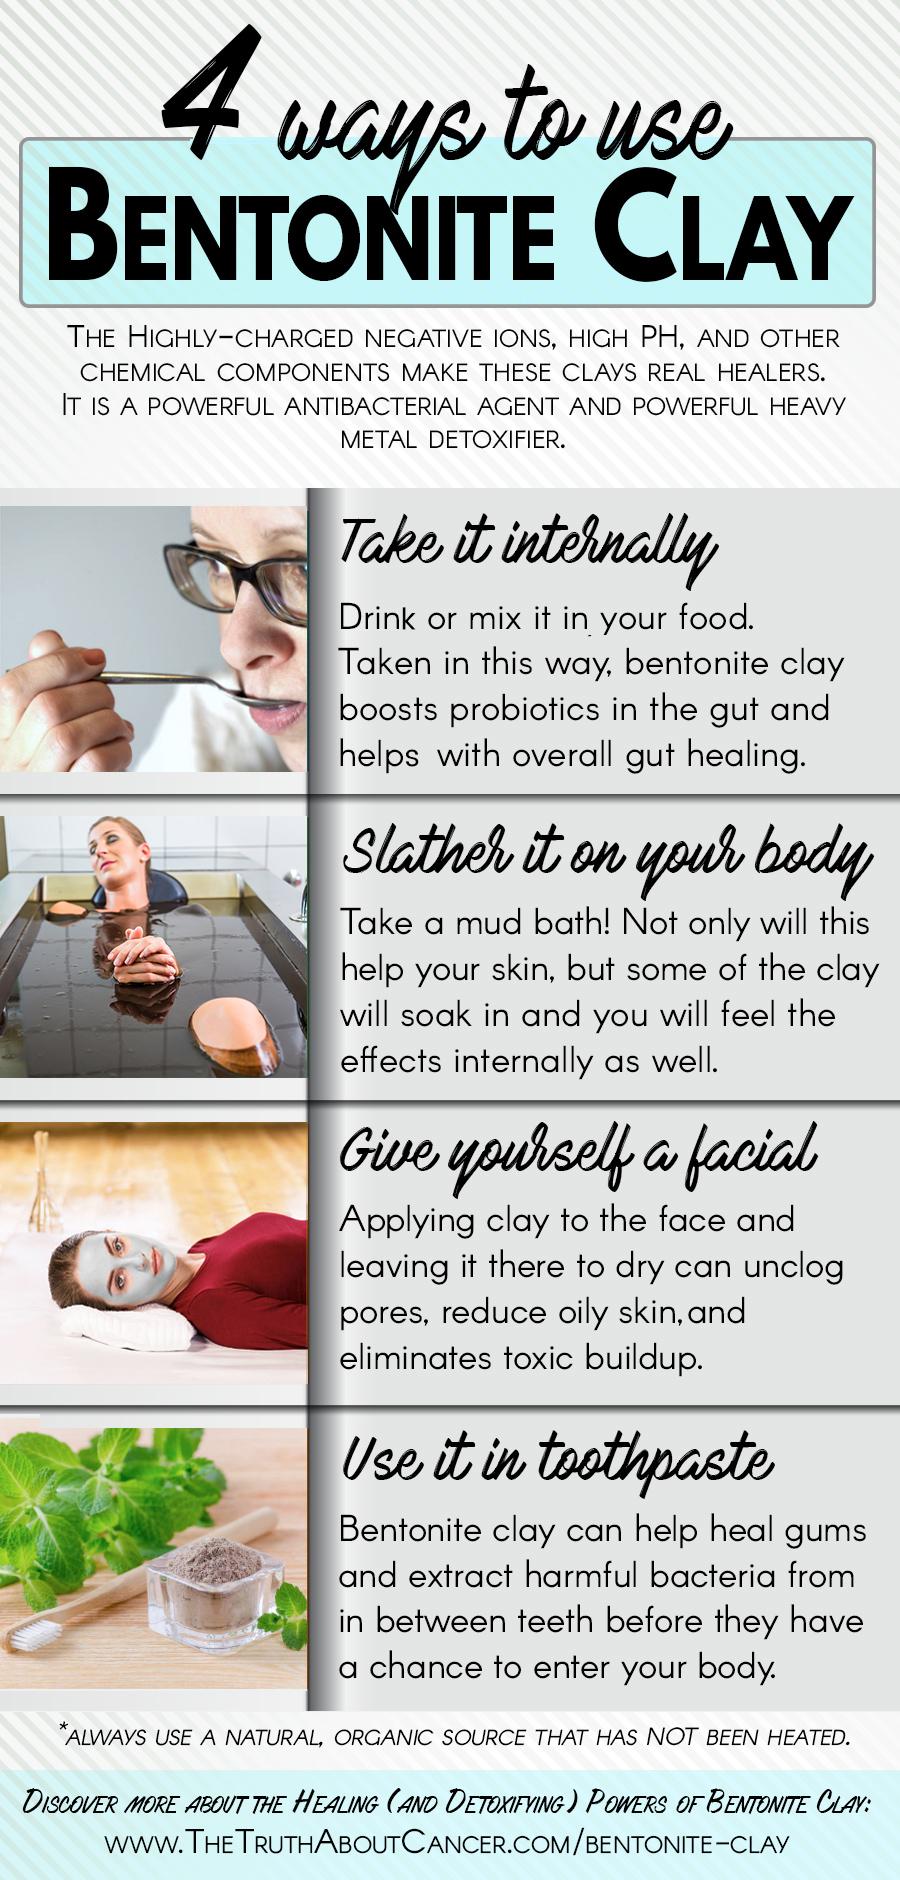 4 ways to use bentonite clay